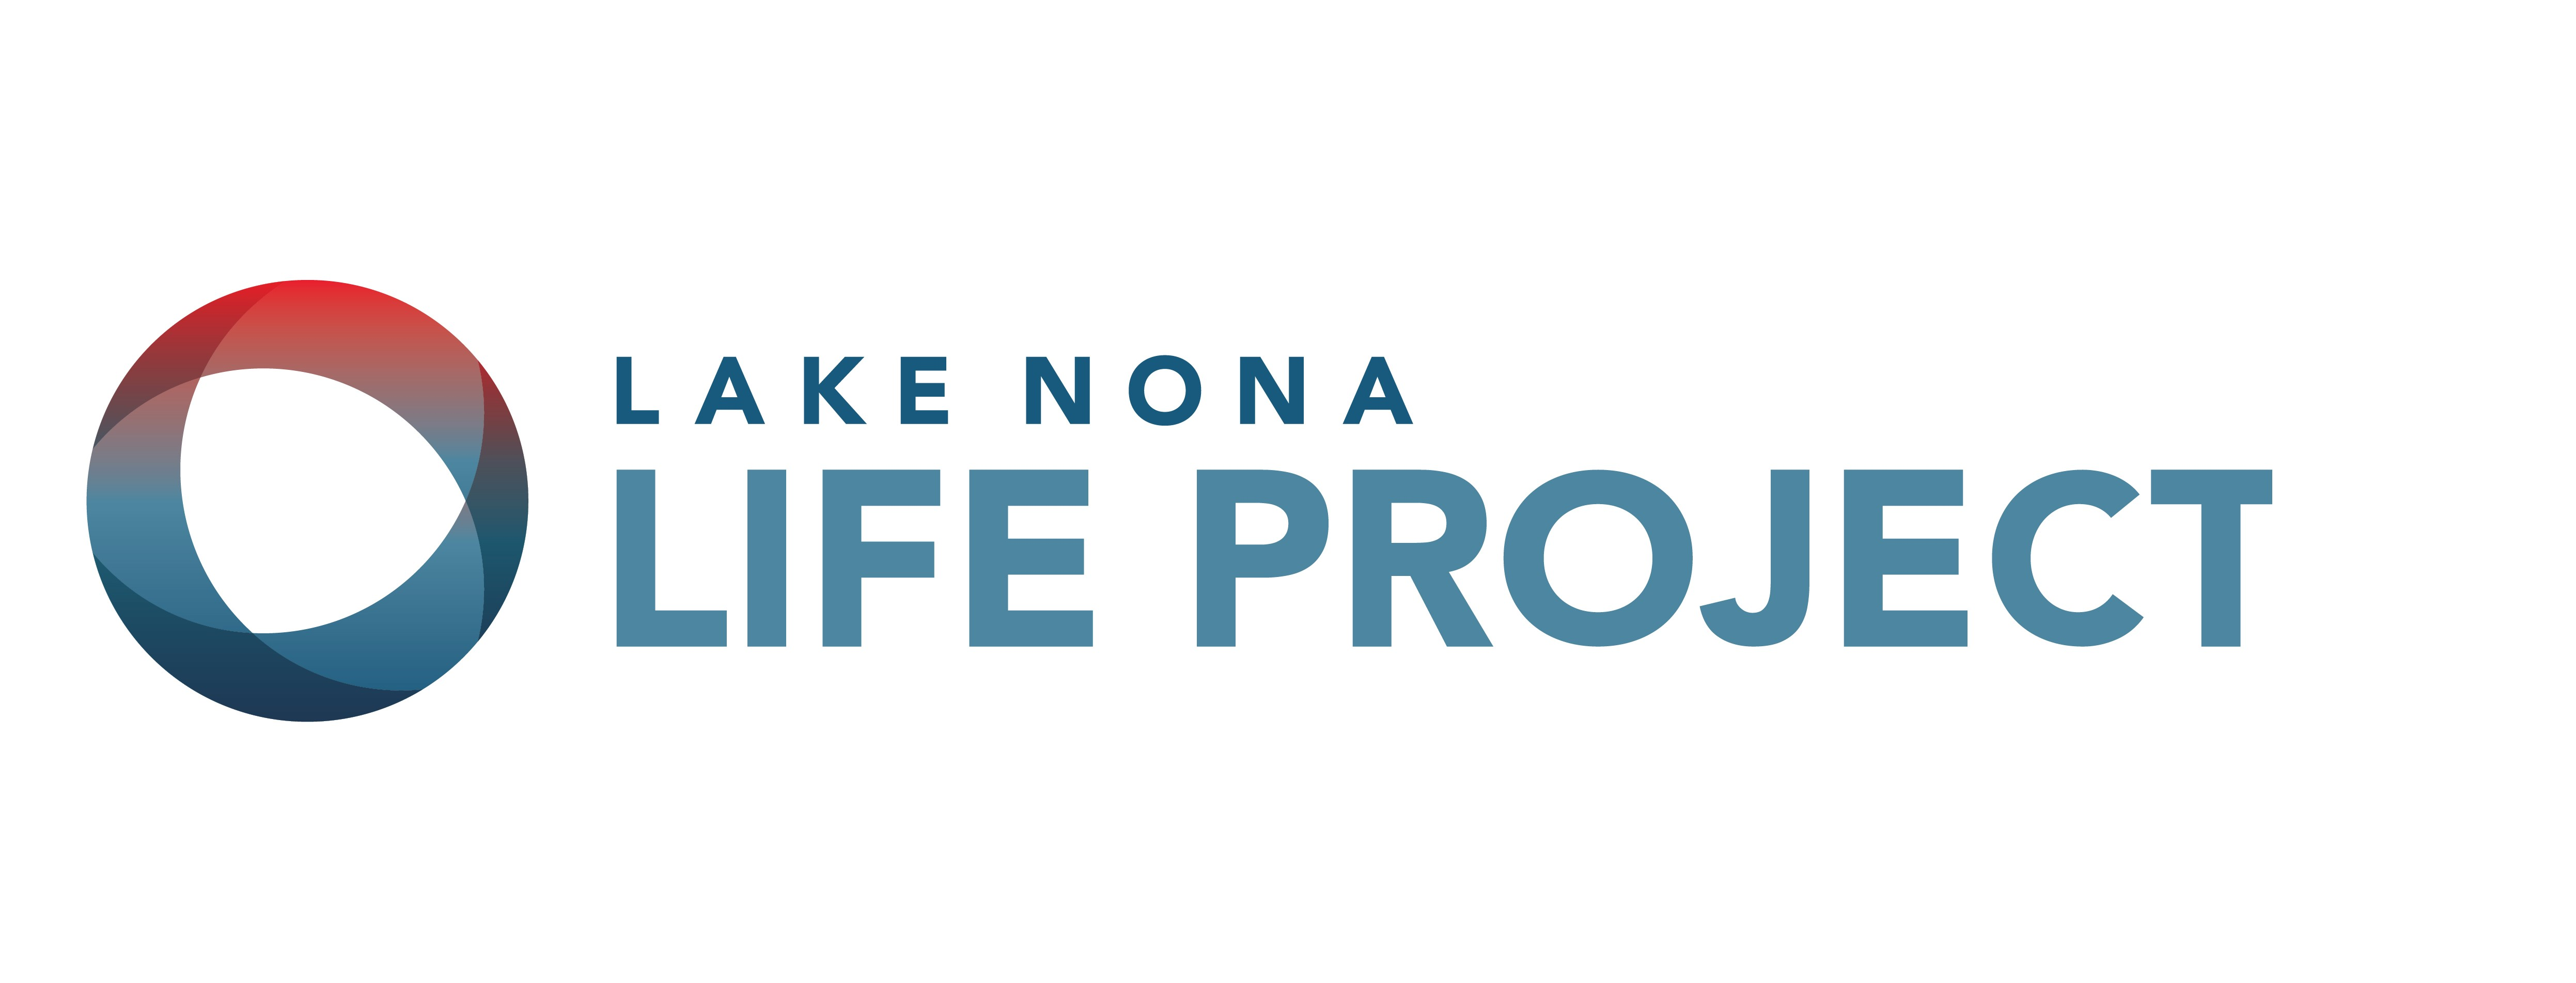 Lake Nona Life Project logo